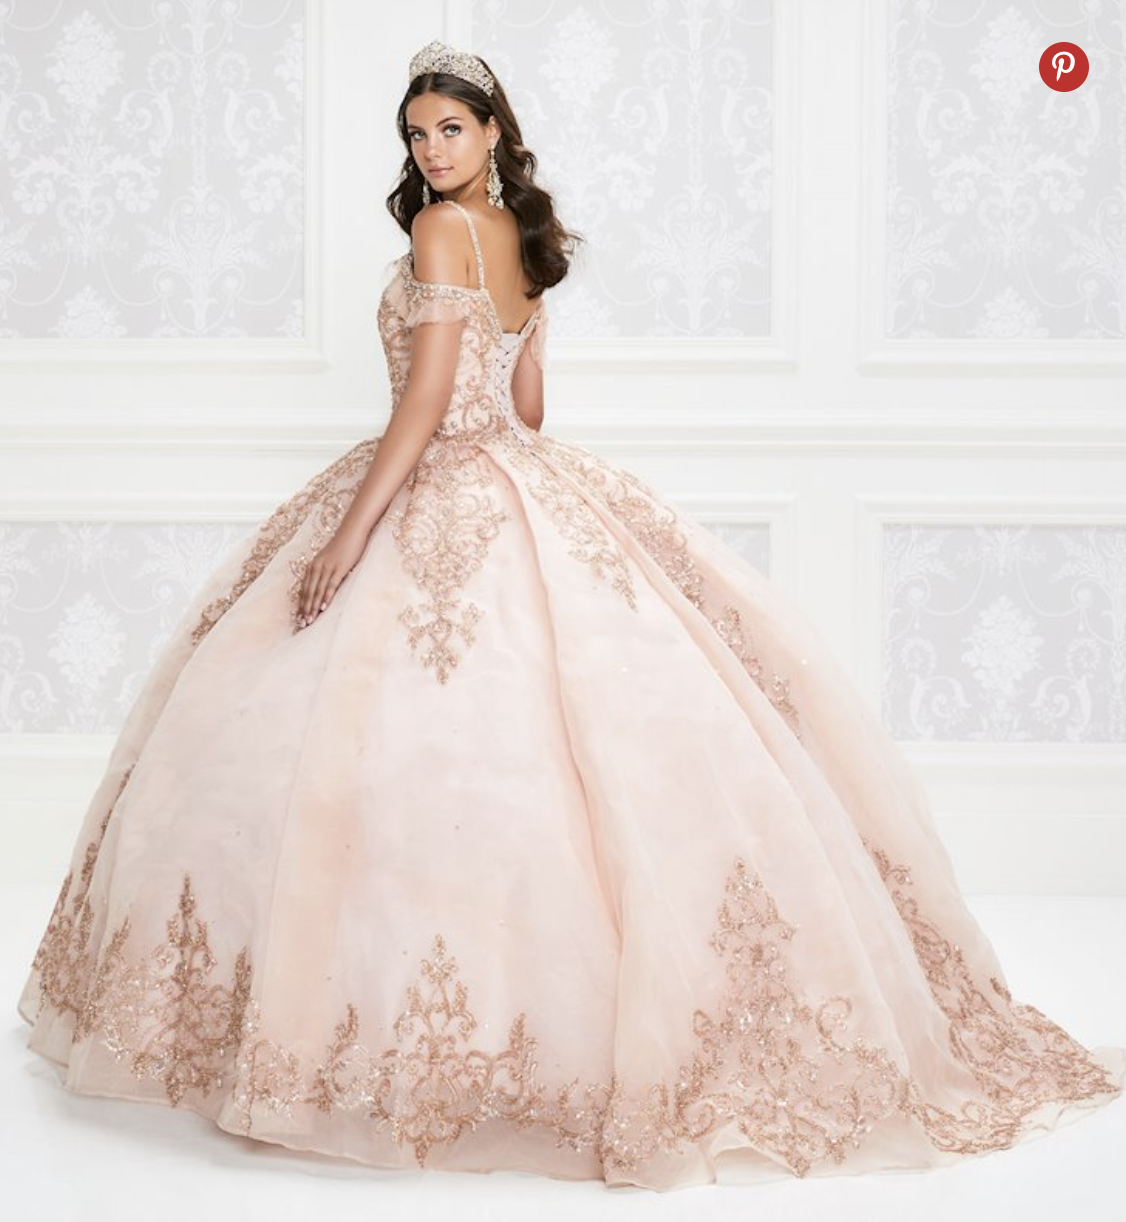 Princesa By Ariana Vara PR12008